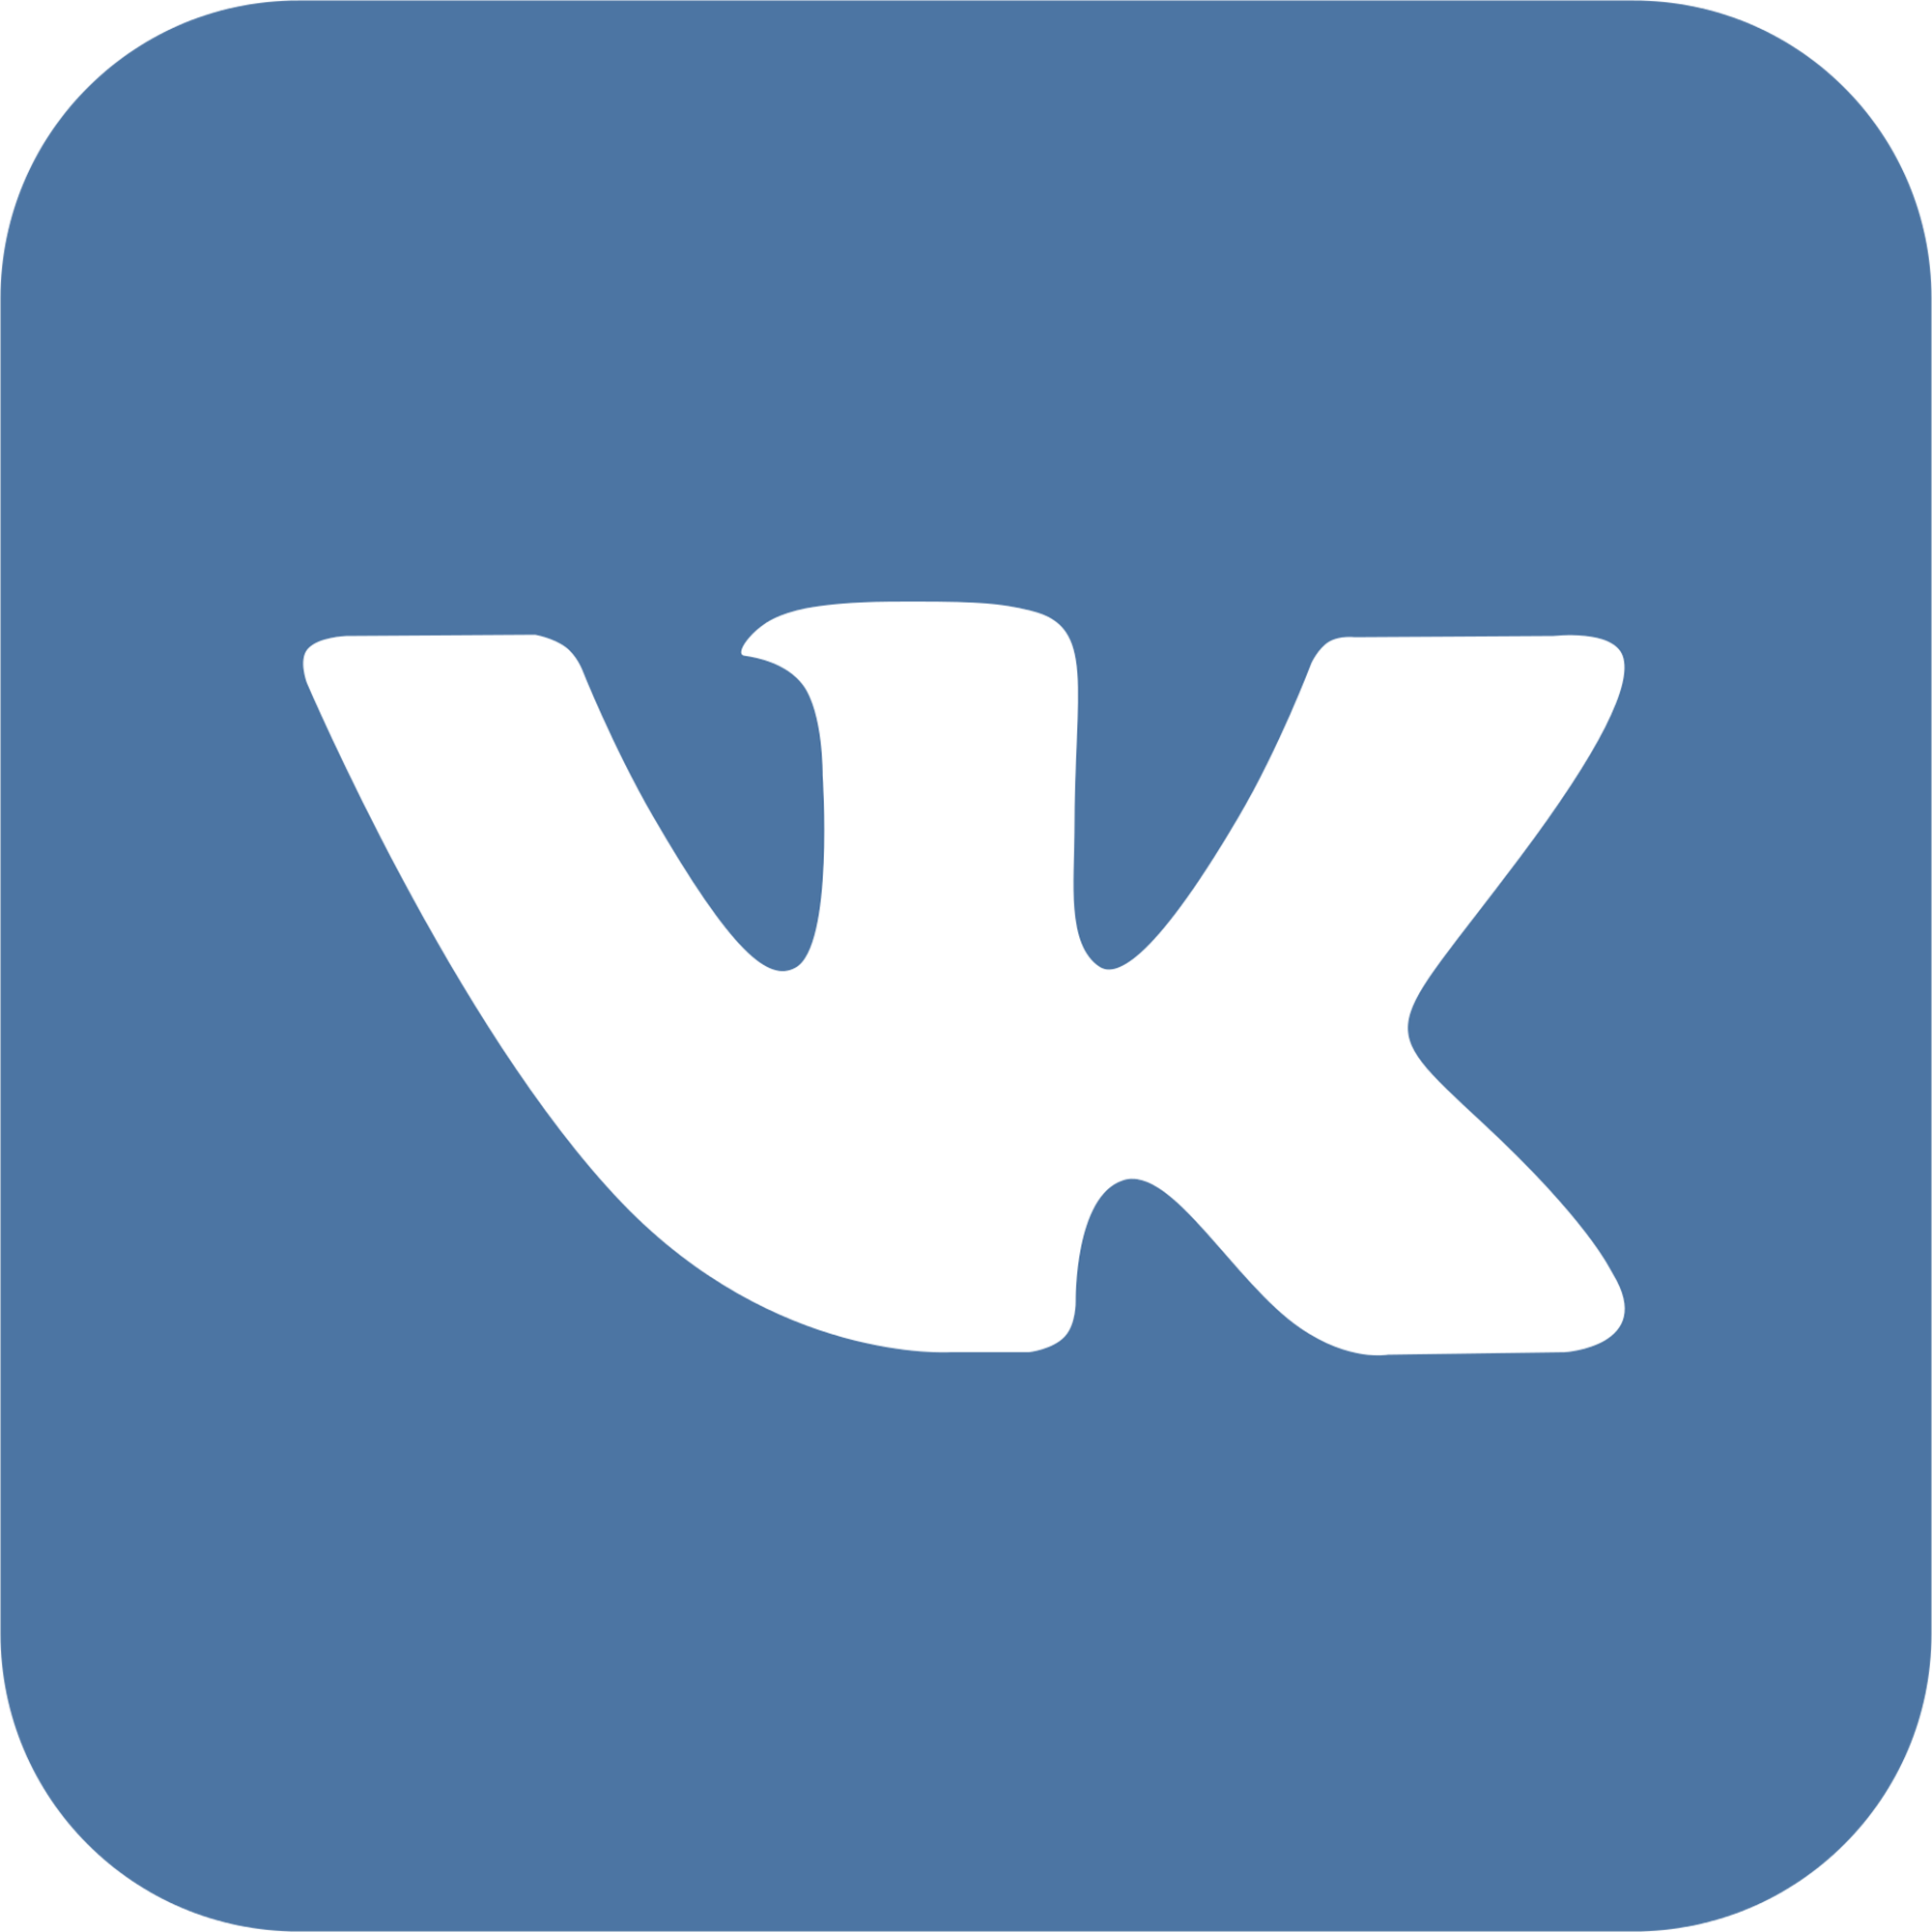 New_VK_logo_2016